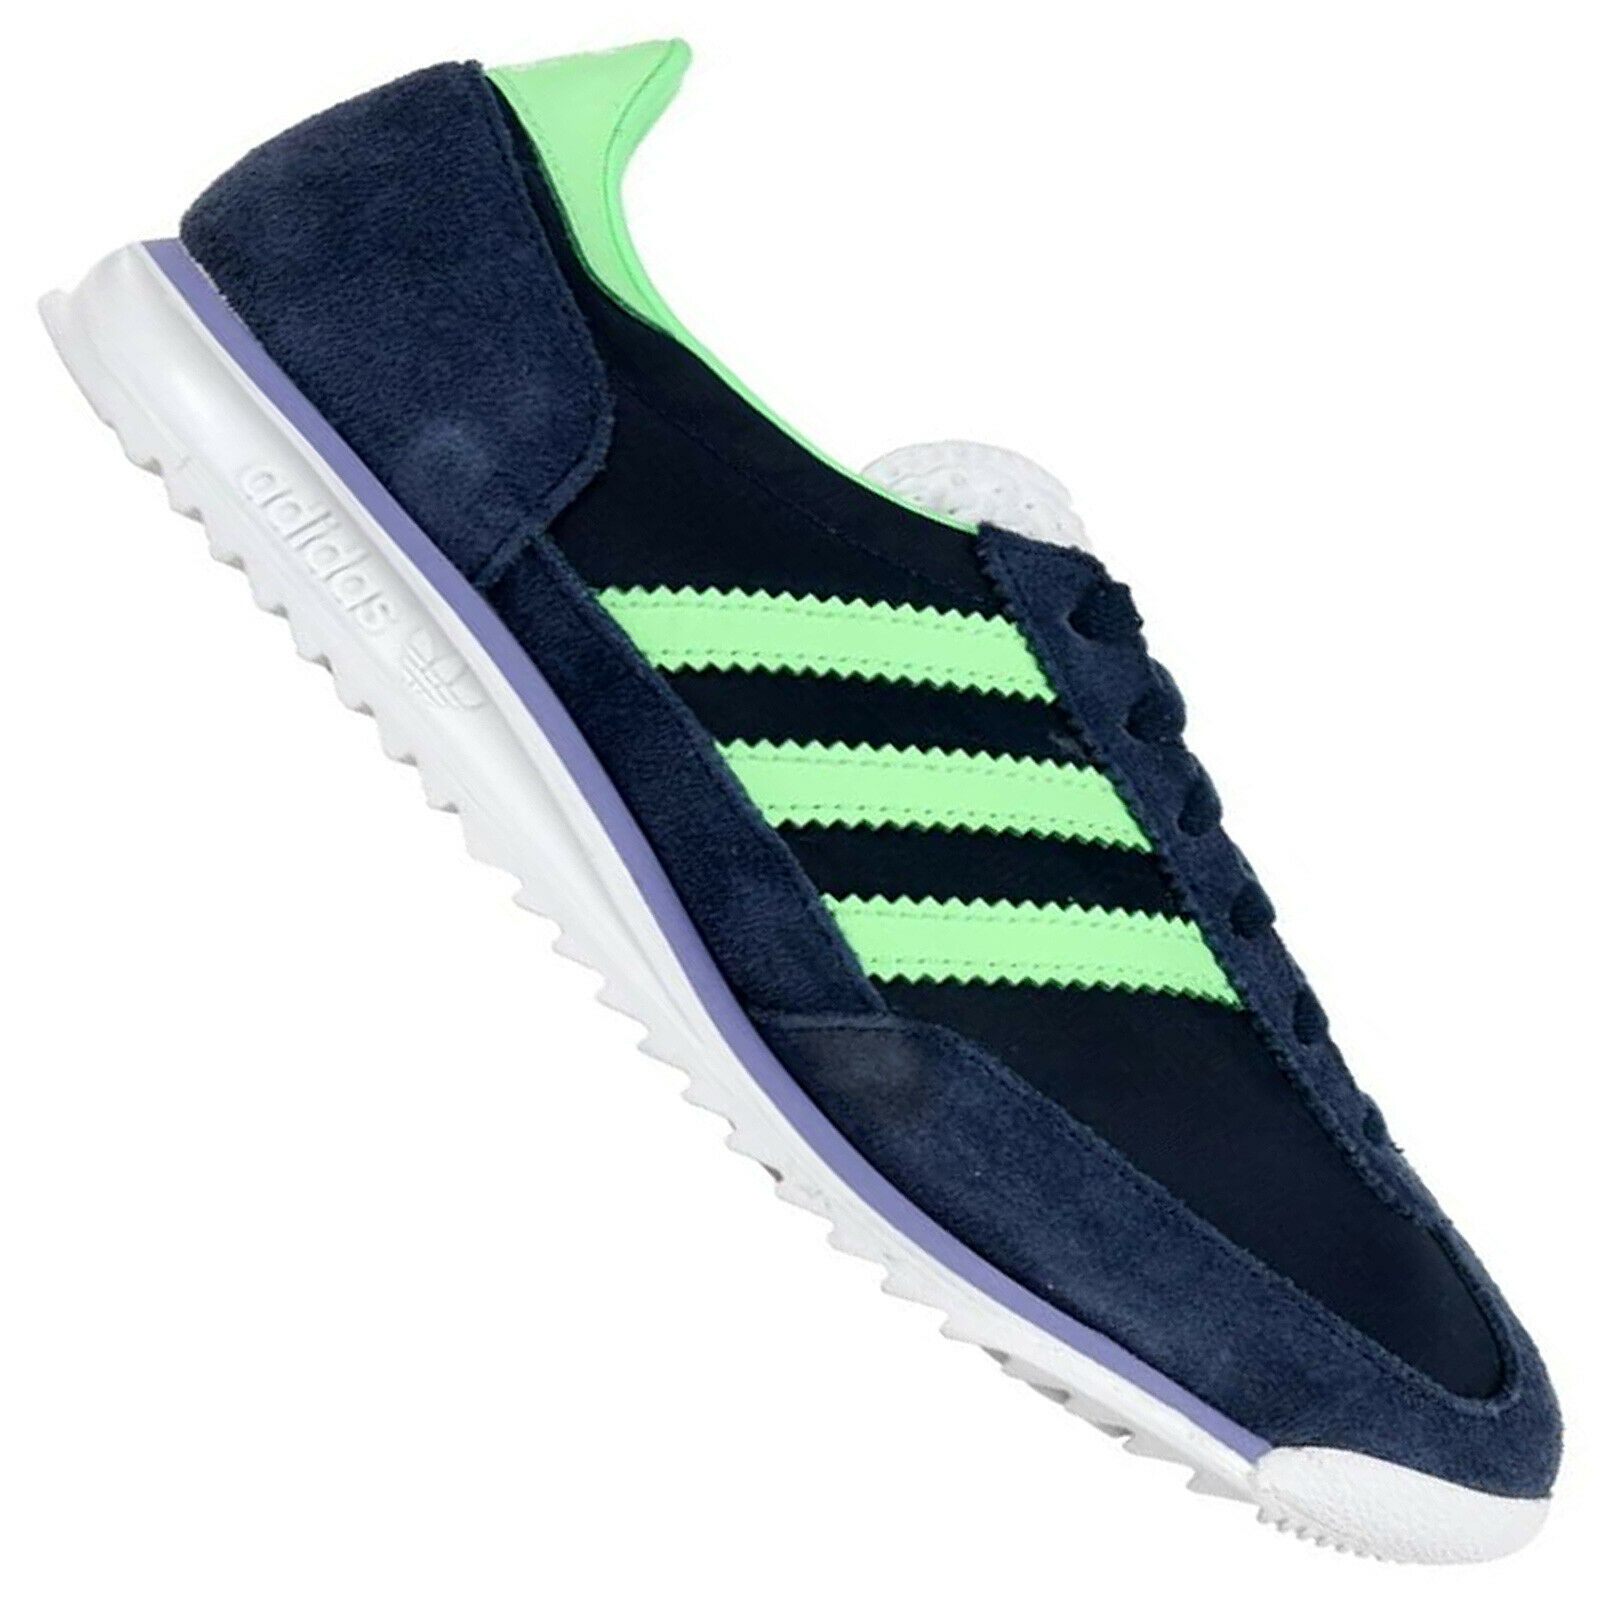 Adidas Originals SL 72 baskets Femmes Loisirs Chaussures De Sport m19226 Chaussures De Course Navy